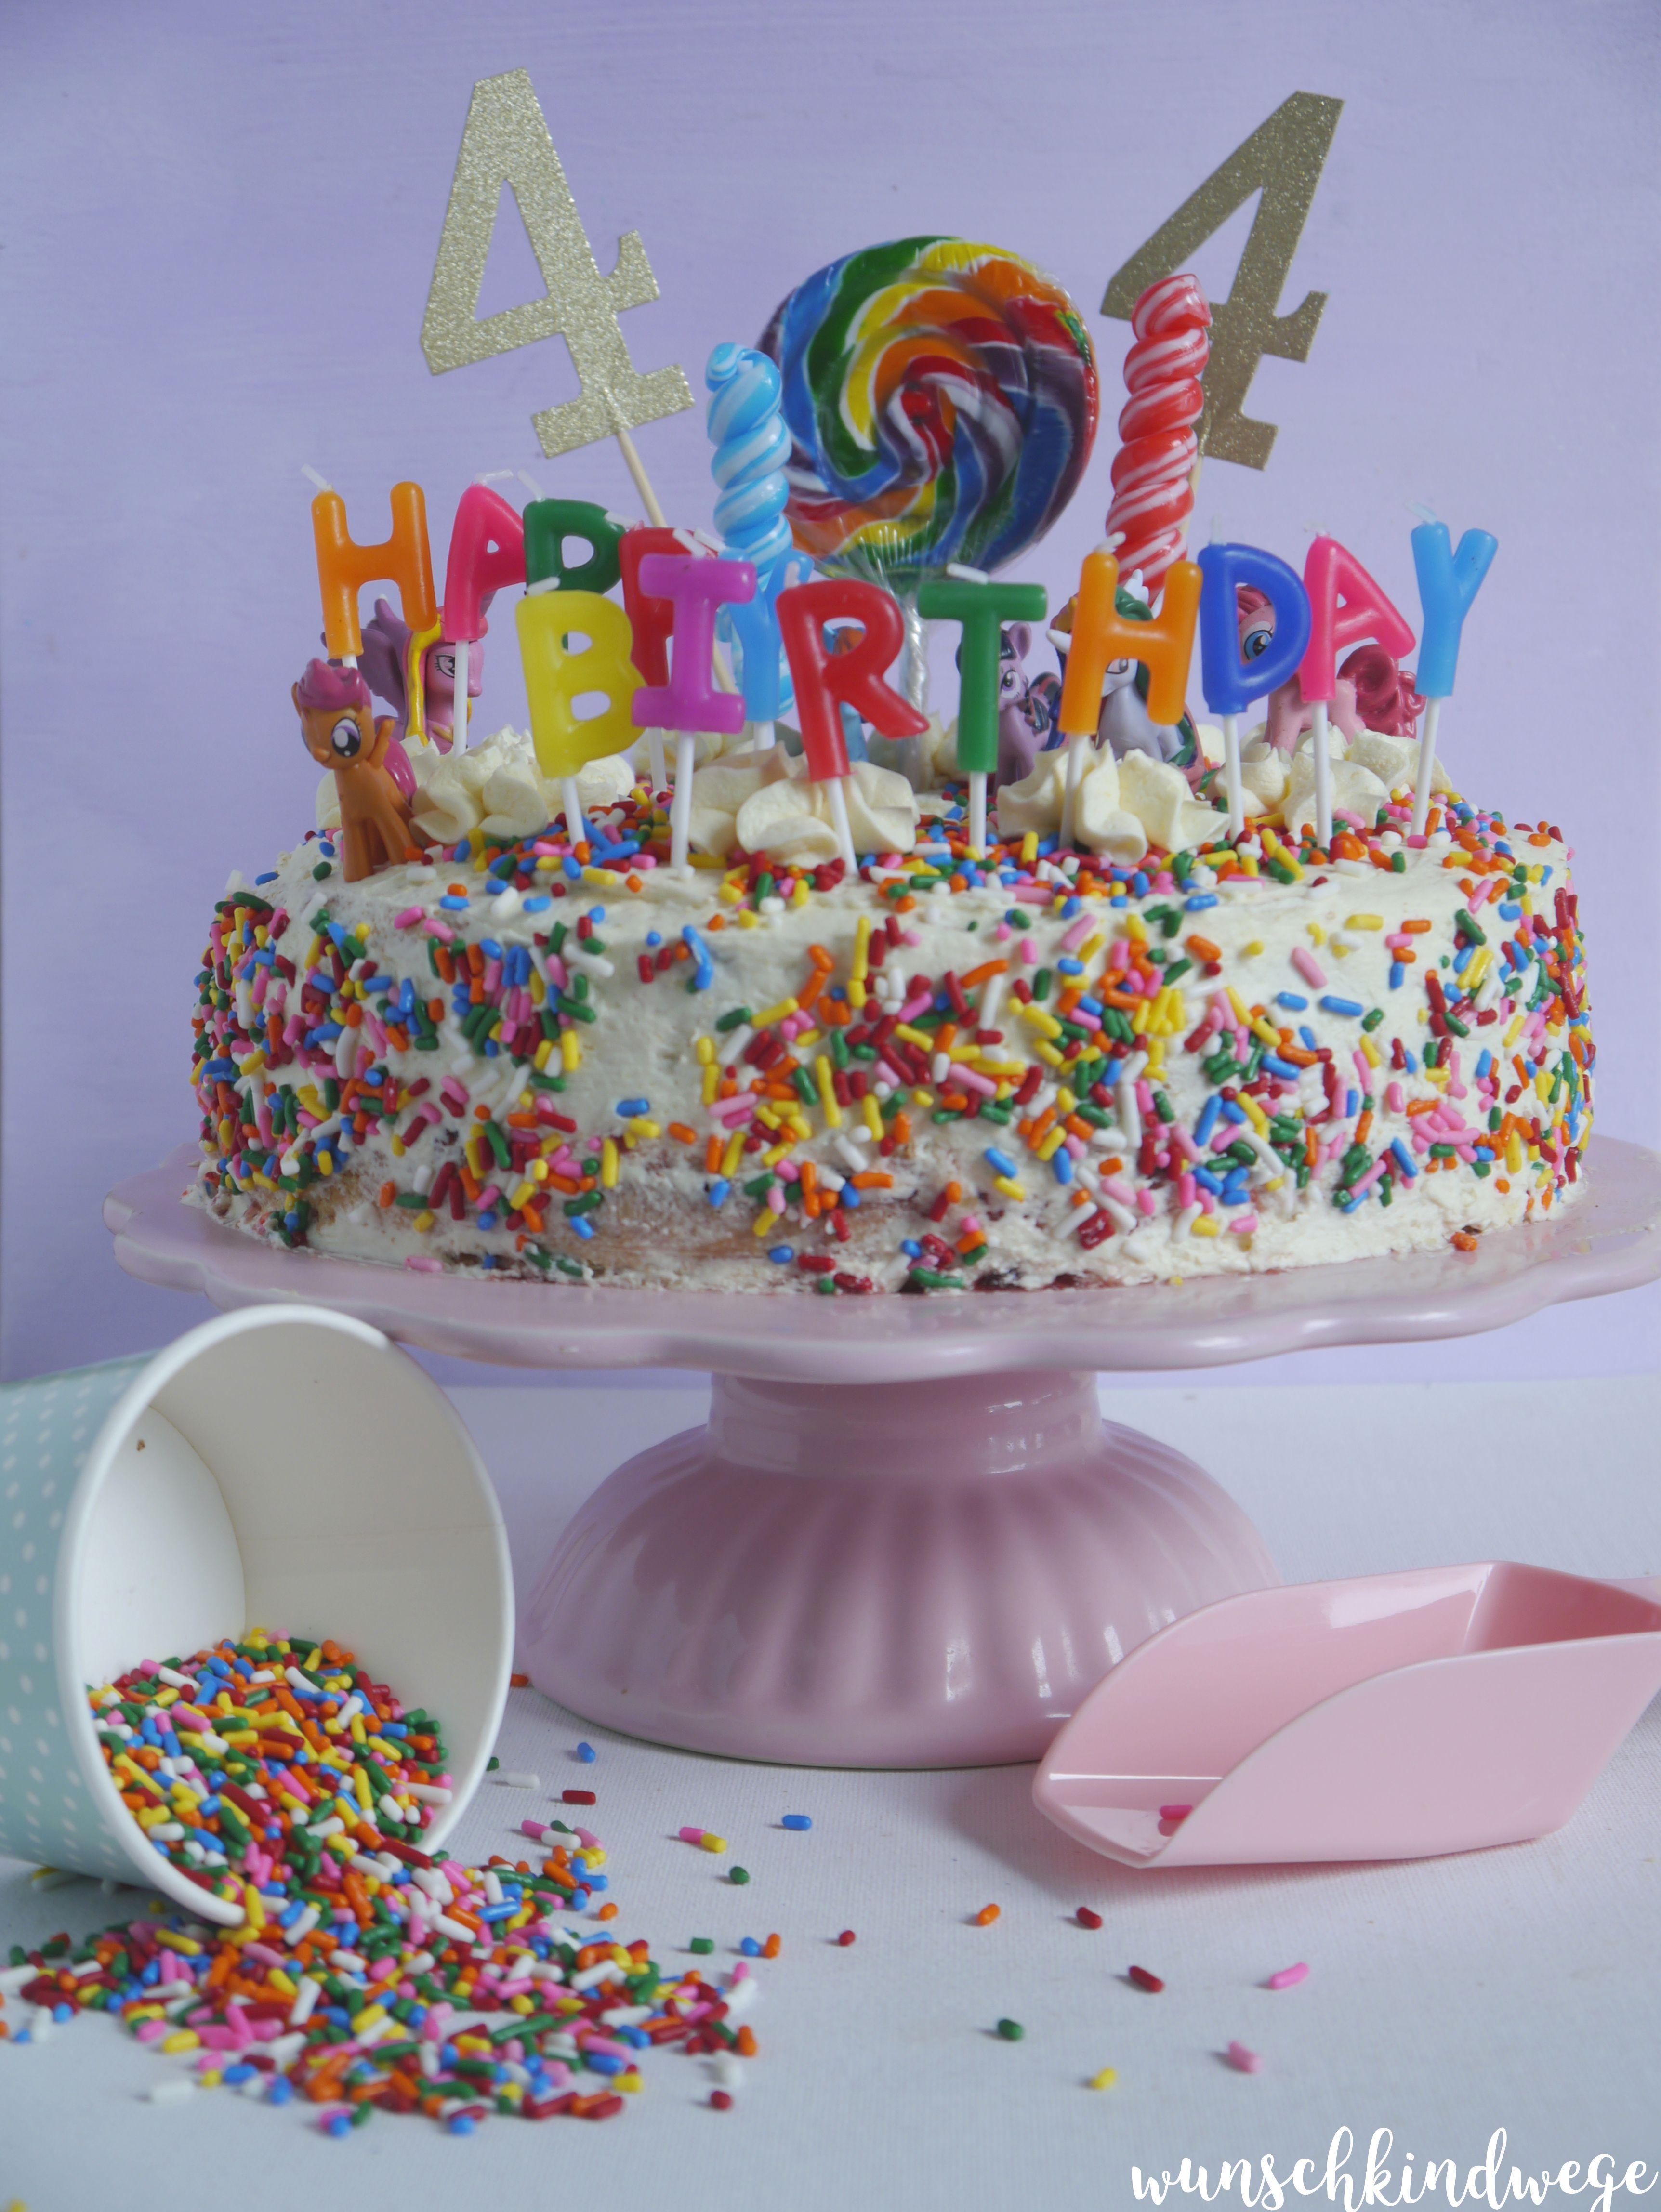 My little Pony Torte Candy Cake